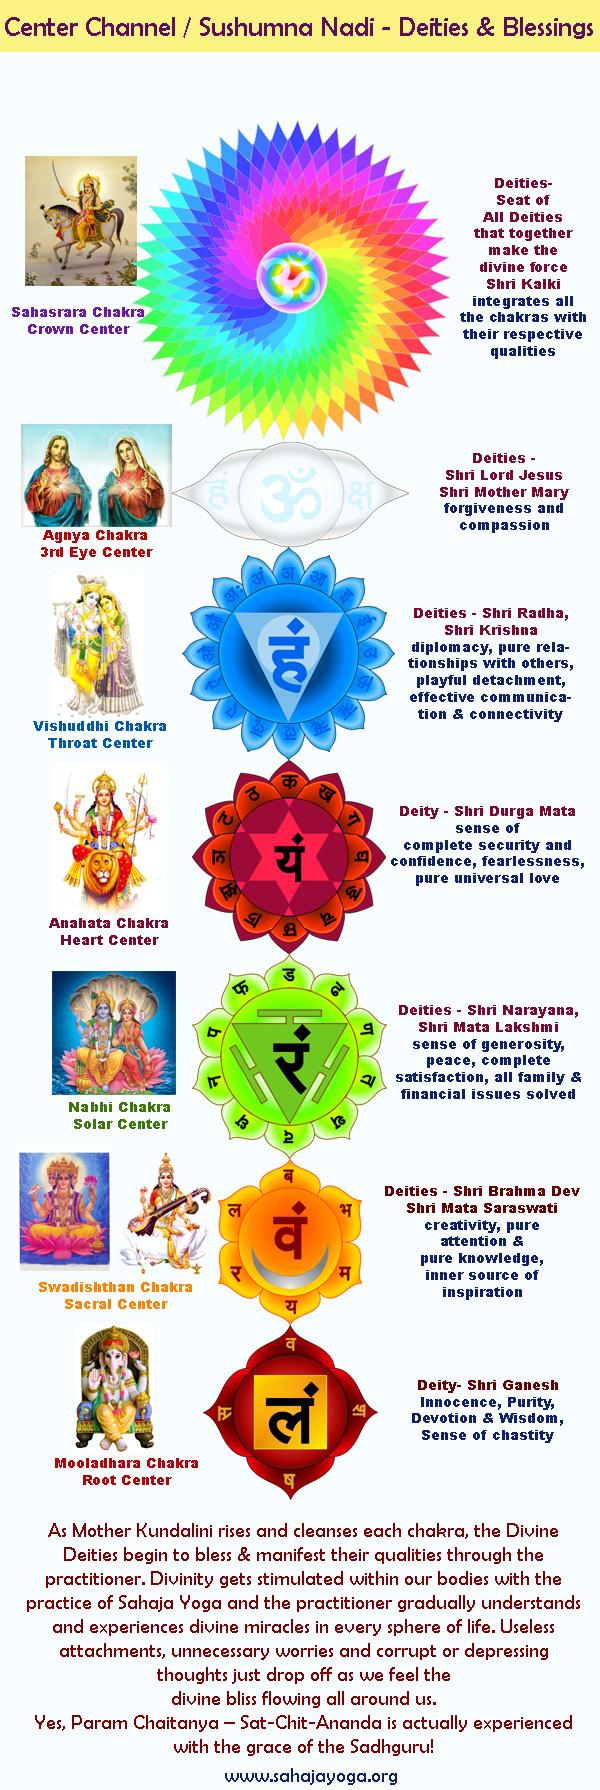 sushumna-nadi-blessings-deities-aumaparna